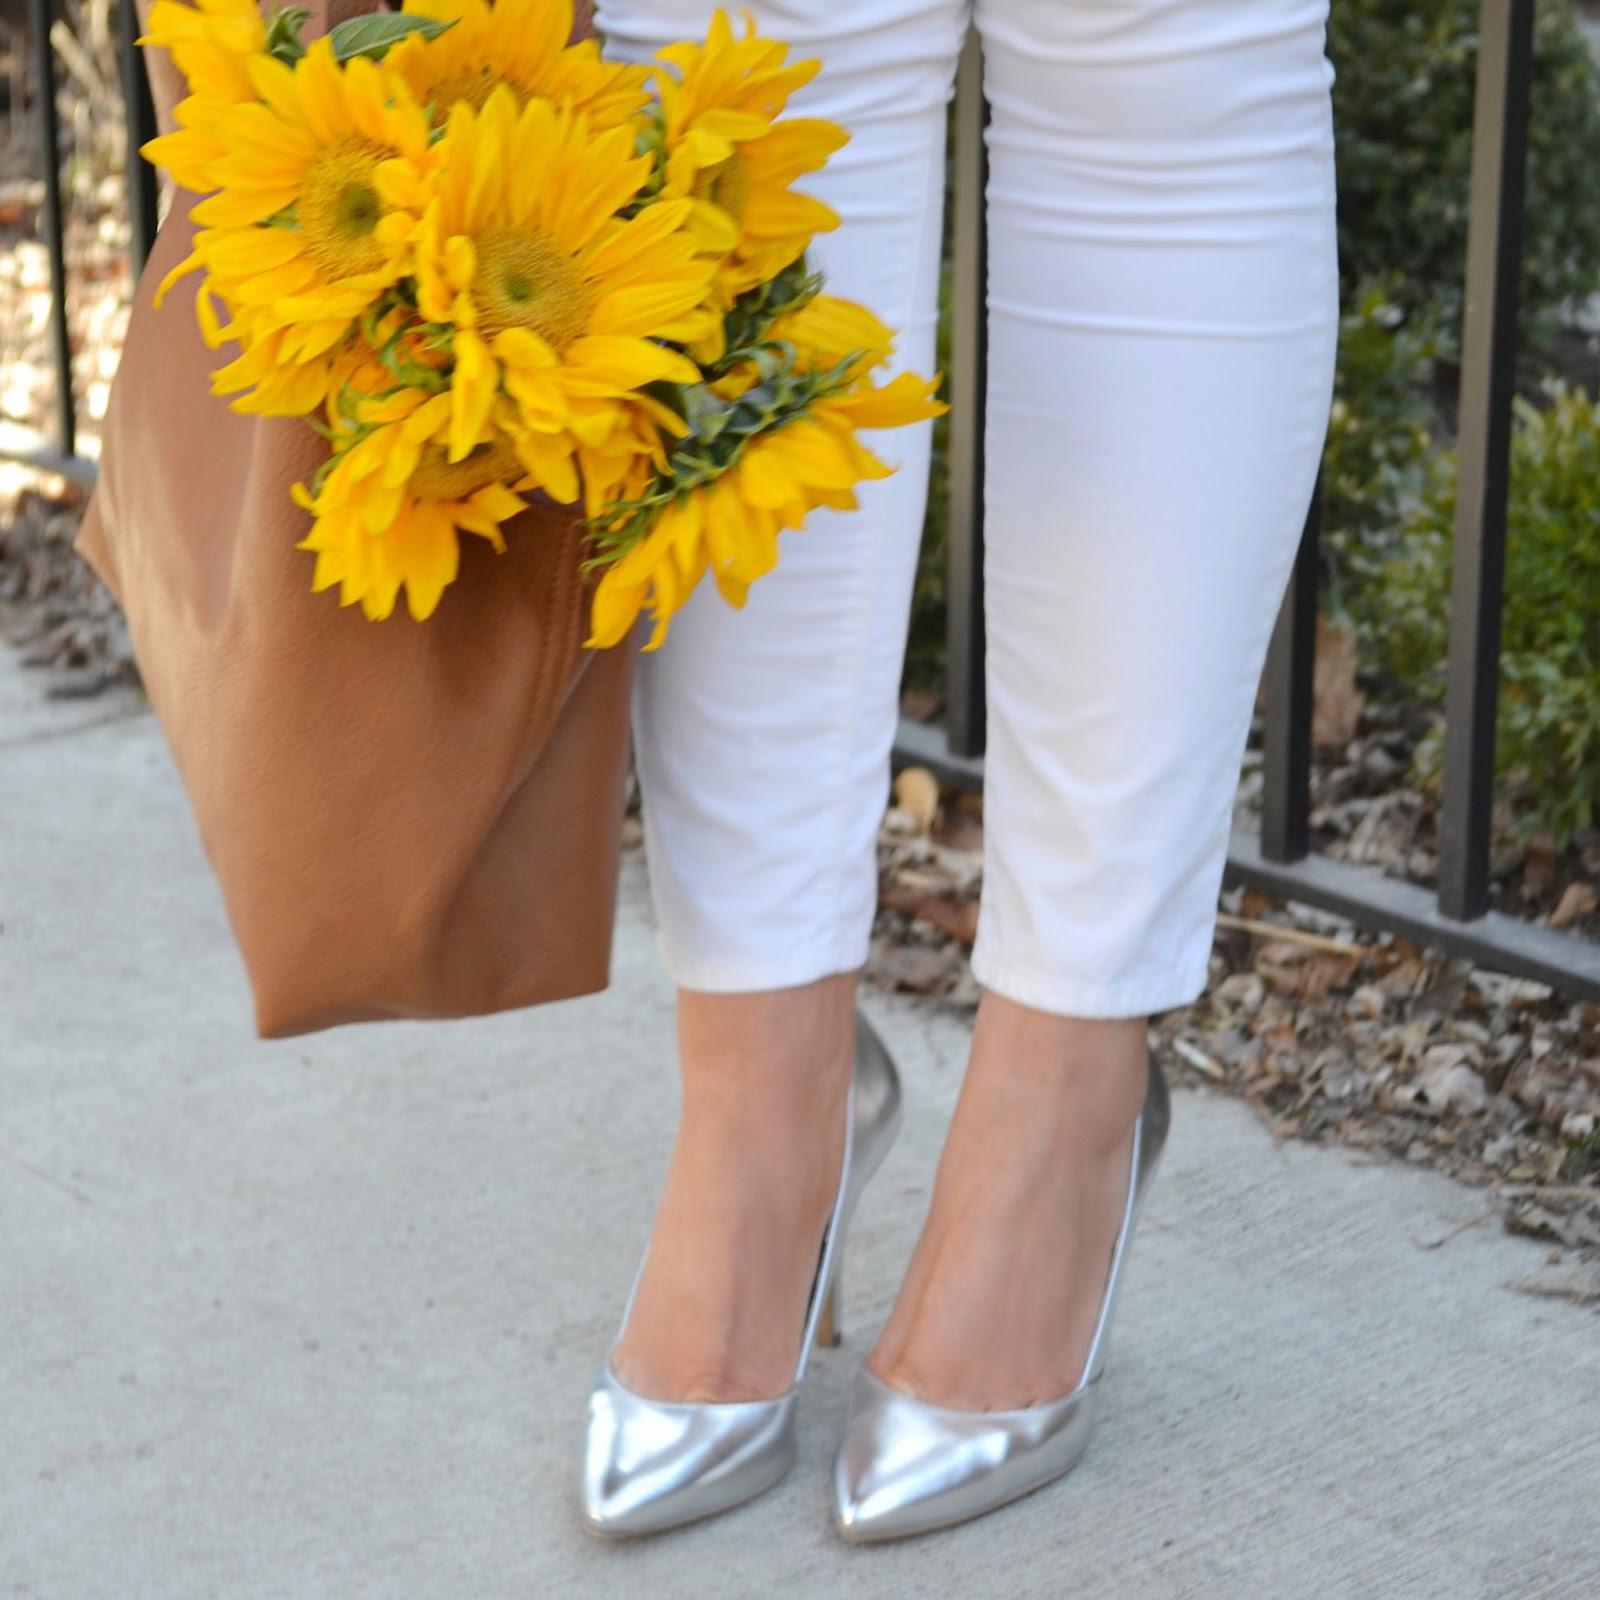 christian siriano silver heels